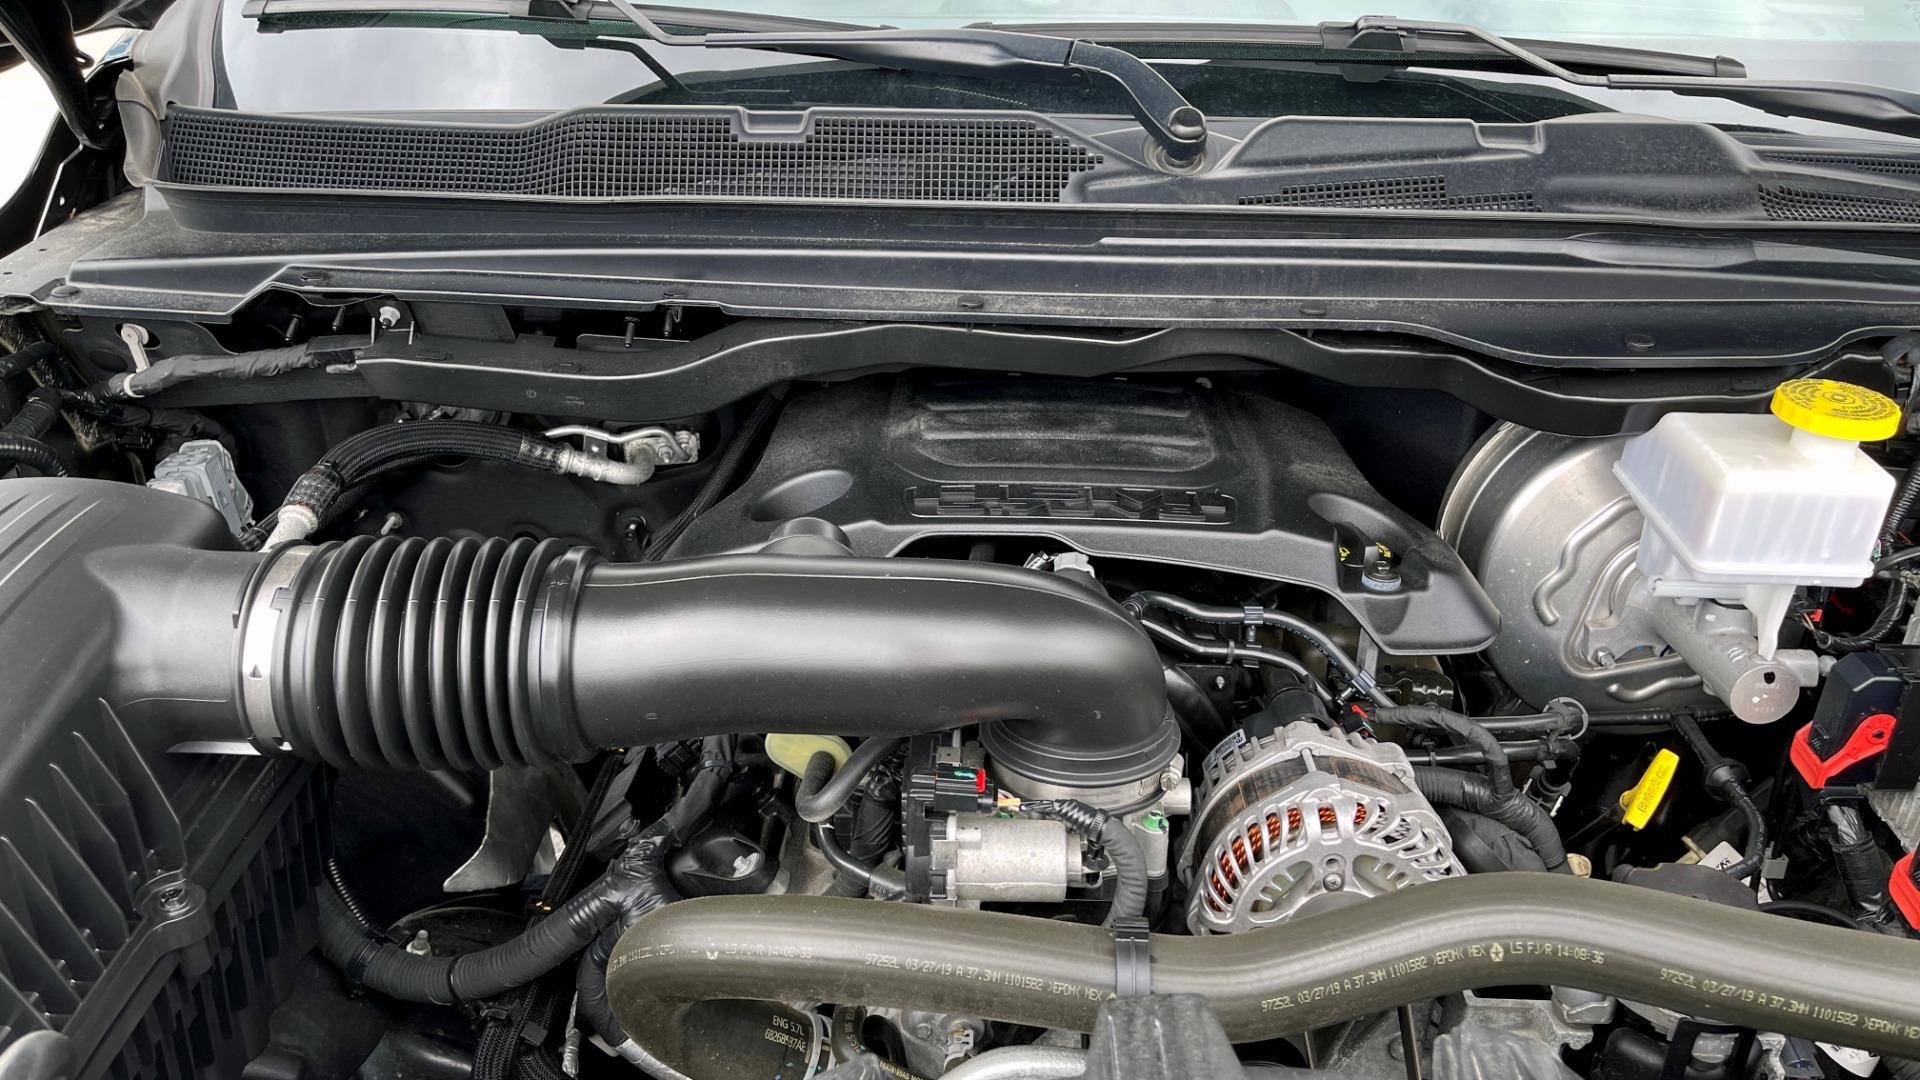 Used 2019 Ram 1500 REBEL QUADCAB 4X4 / 5.7L HEMI / 8-SPD AUTO / REMOTE START / PARK ASSIST for sale $44,495 at Formula Imports in Charlotte NC 28227 9